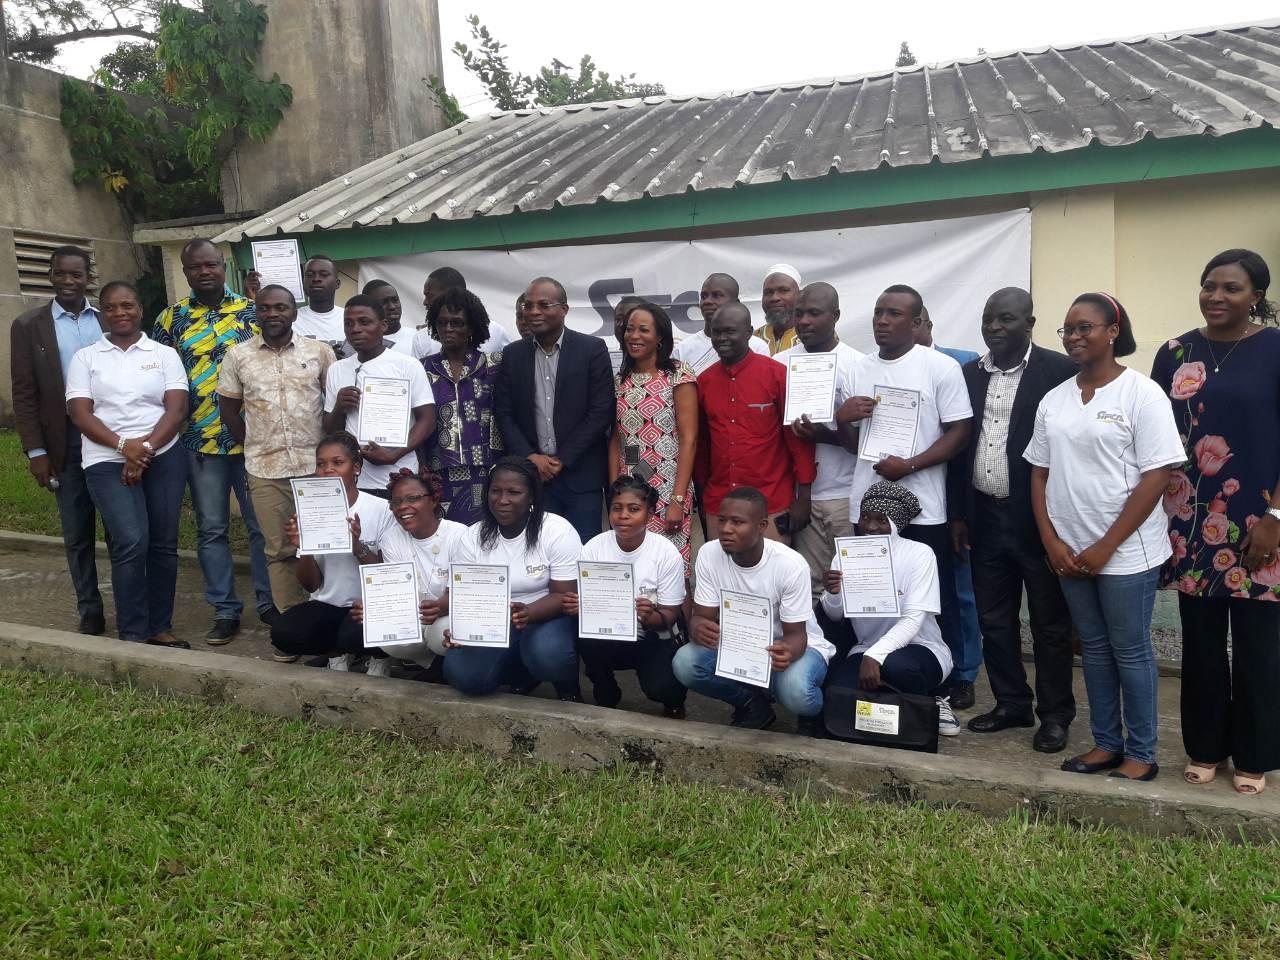 formation,Sifca,Unfpa,15 étudiants